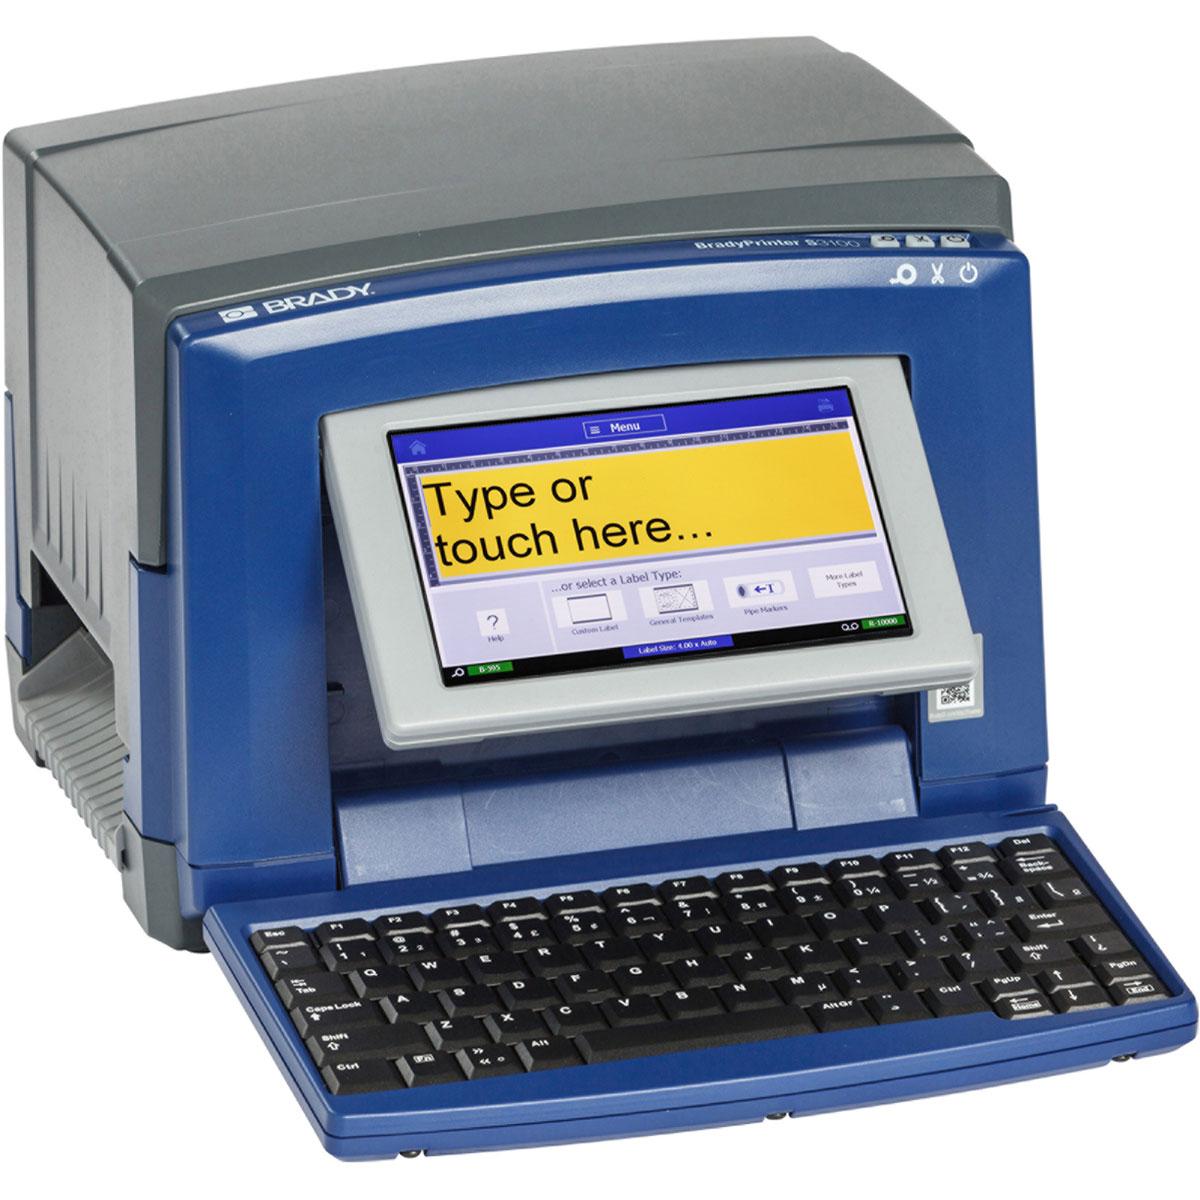 S3100_Printer_v01